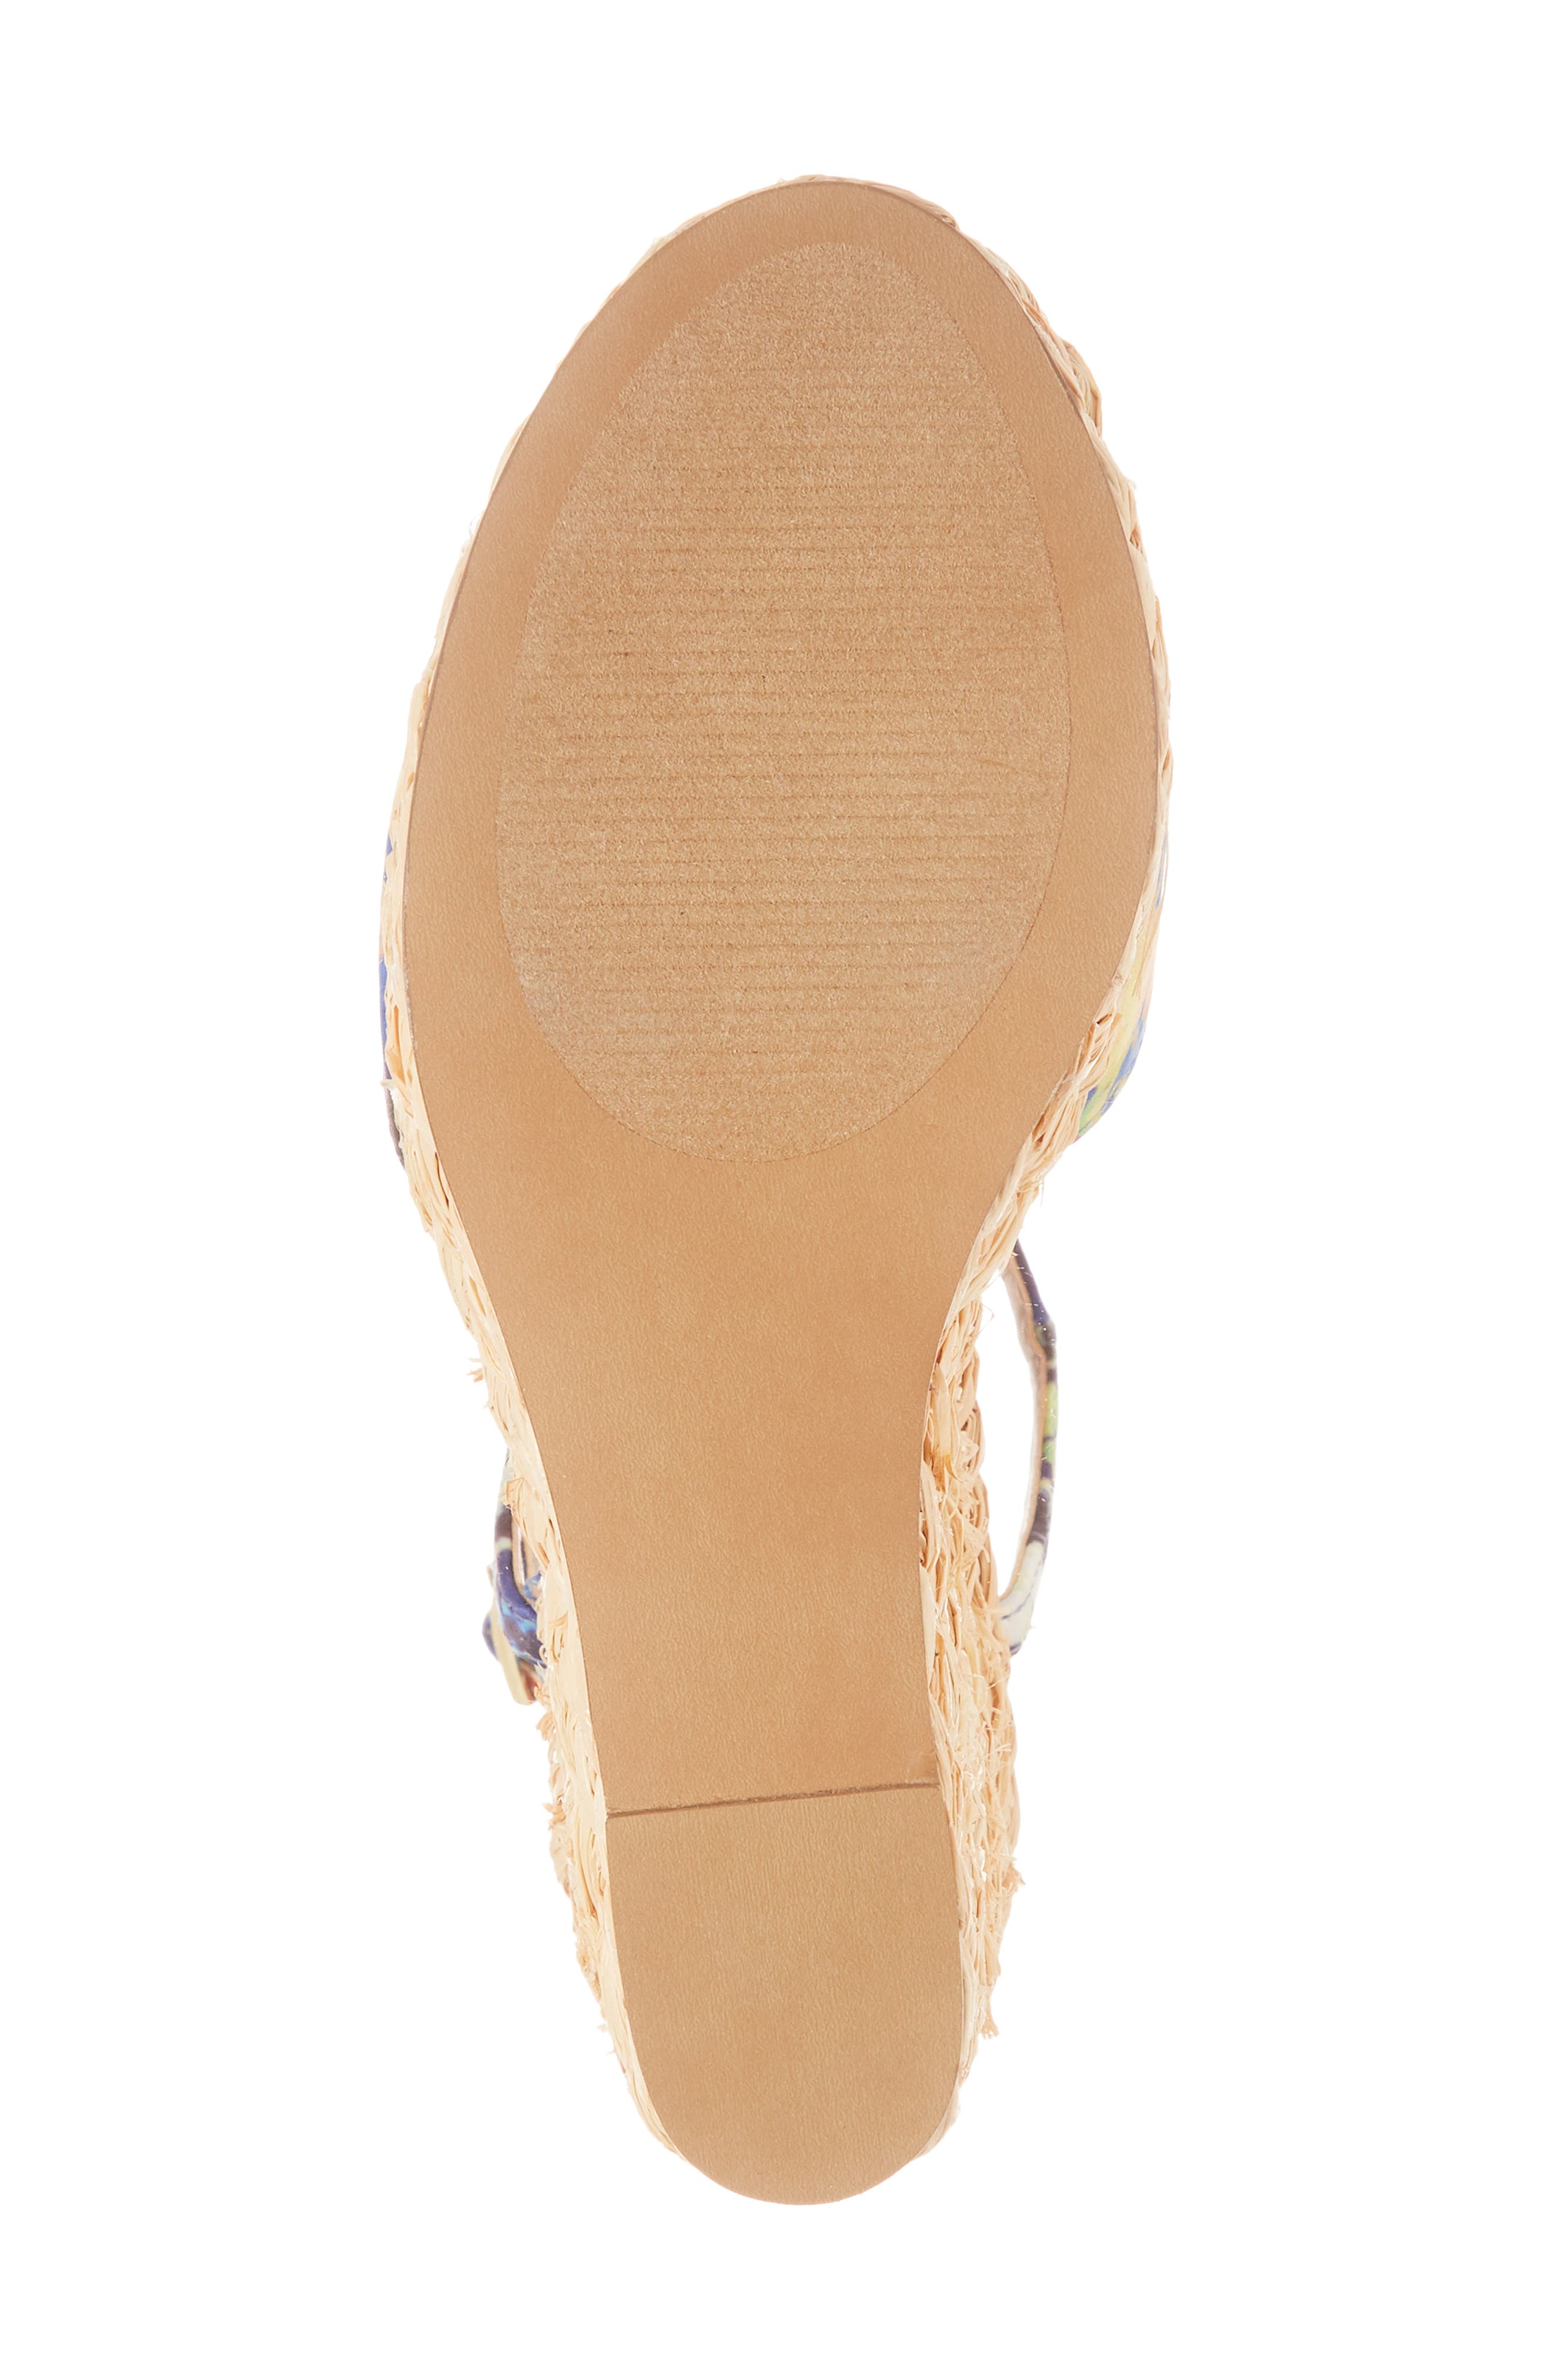 Tokin Espadrille Wedge Sandal,                             Alternate thumbnail 5, color,                             Floral Multi